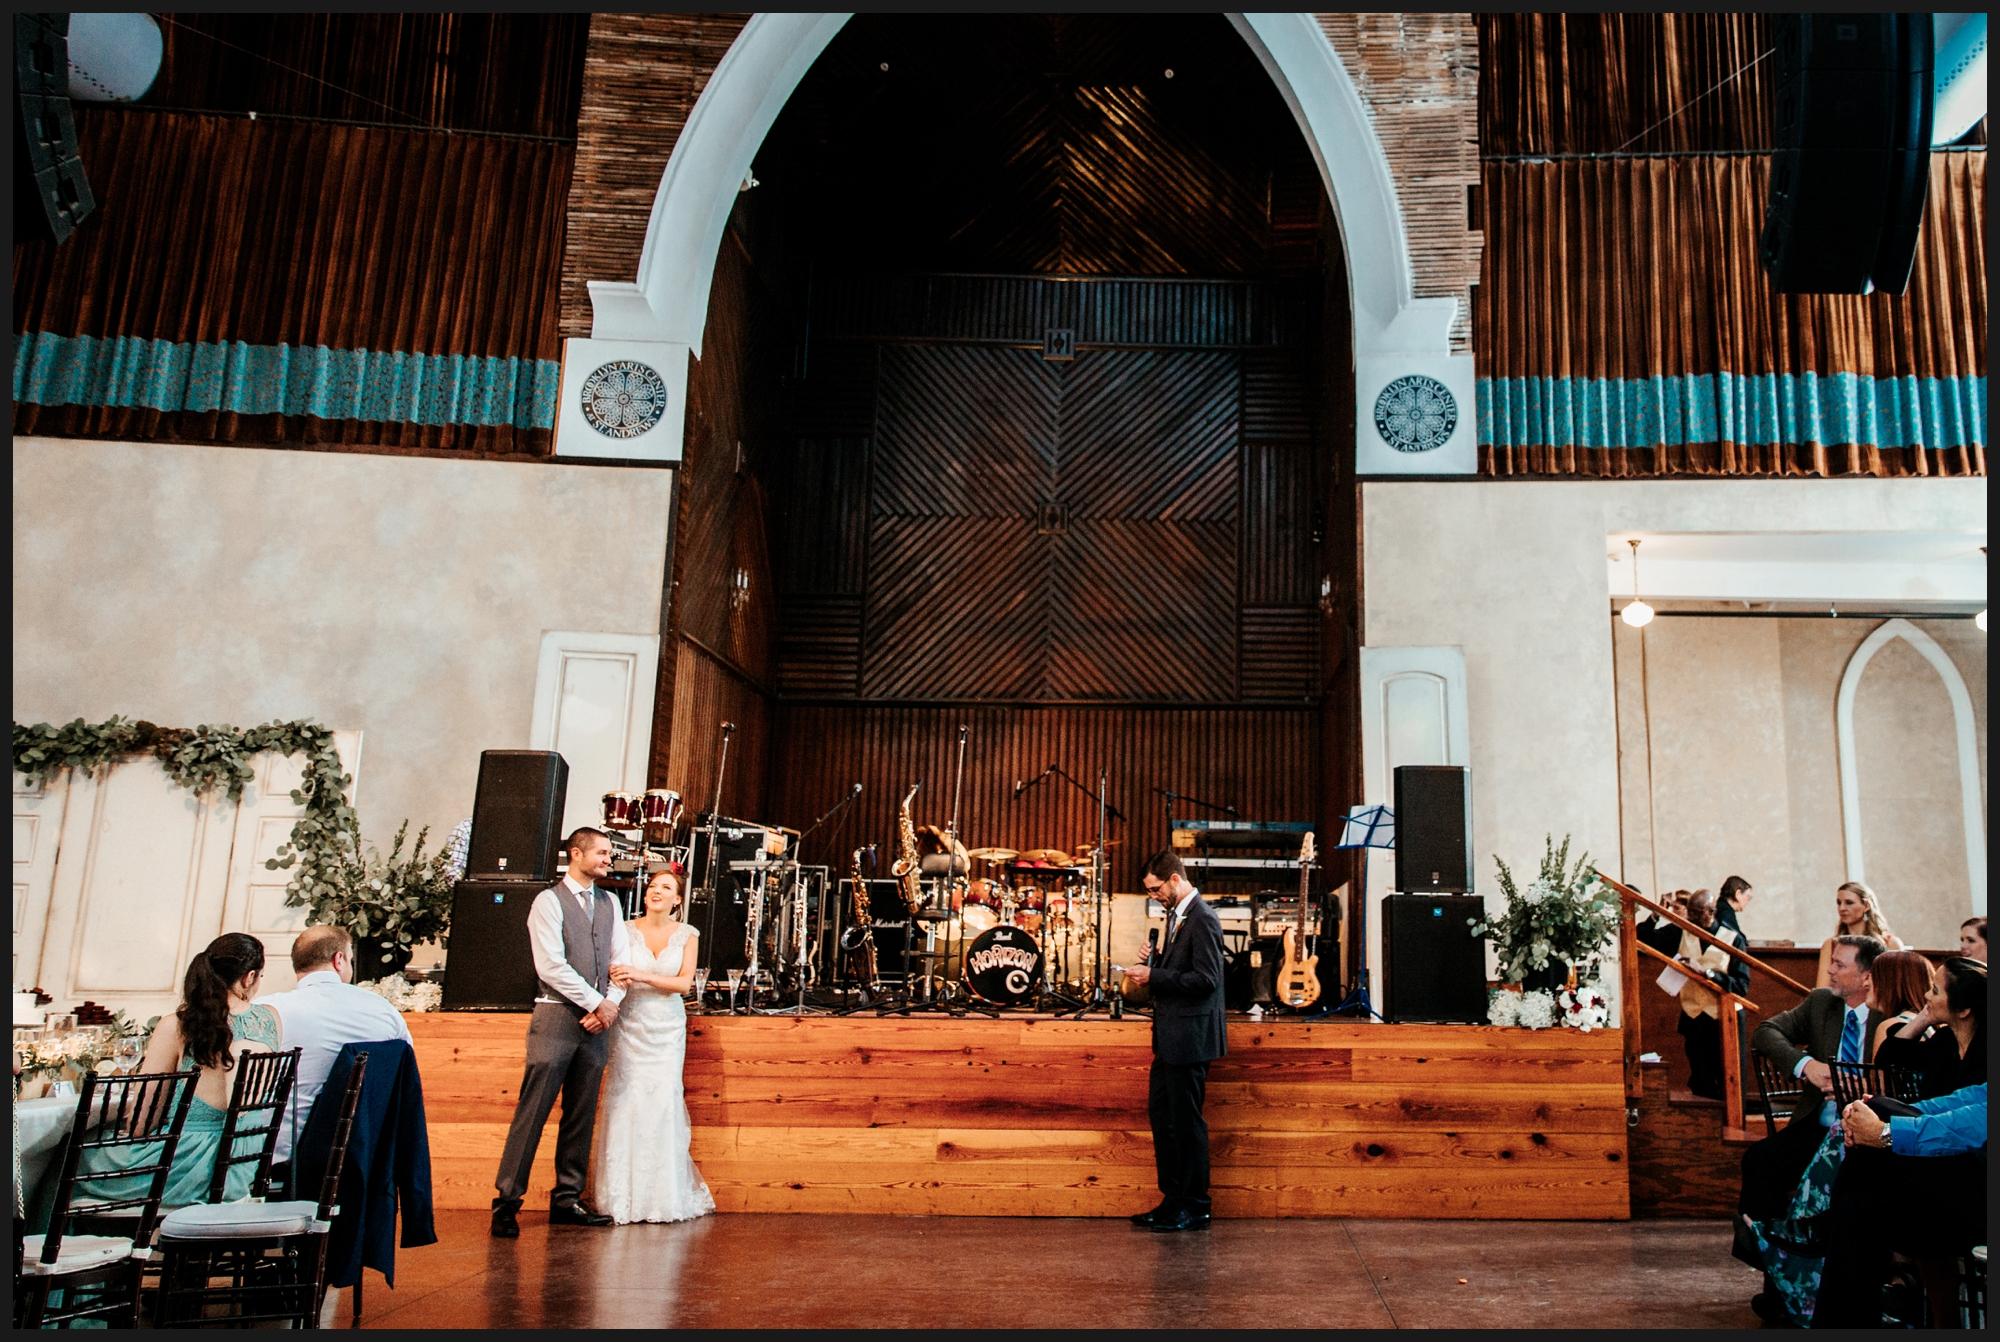 Orlando-Wedding-Photographer-destination-wedding-photographer-florida-wedding-photographer-bohemian-wedding-photographer_0655.jpg